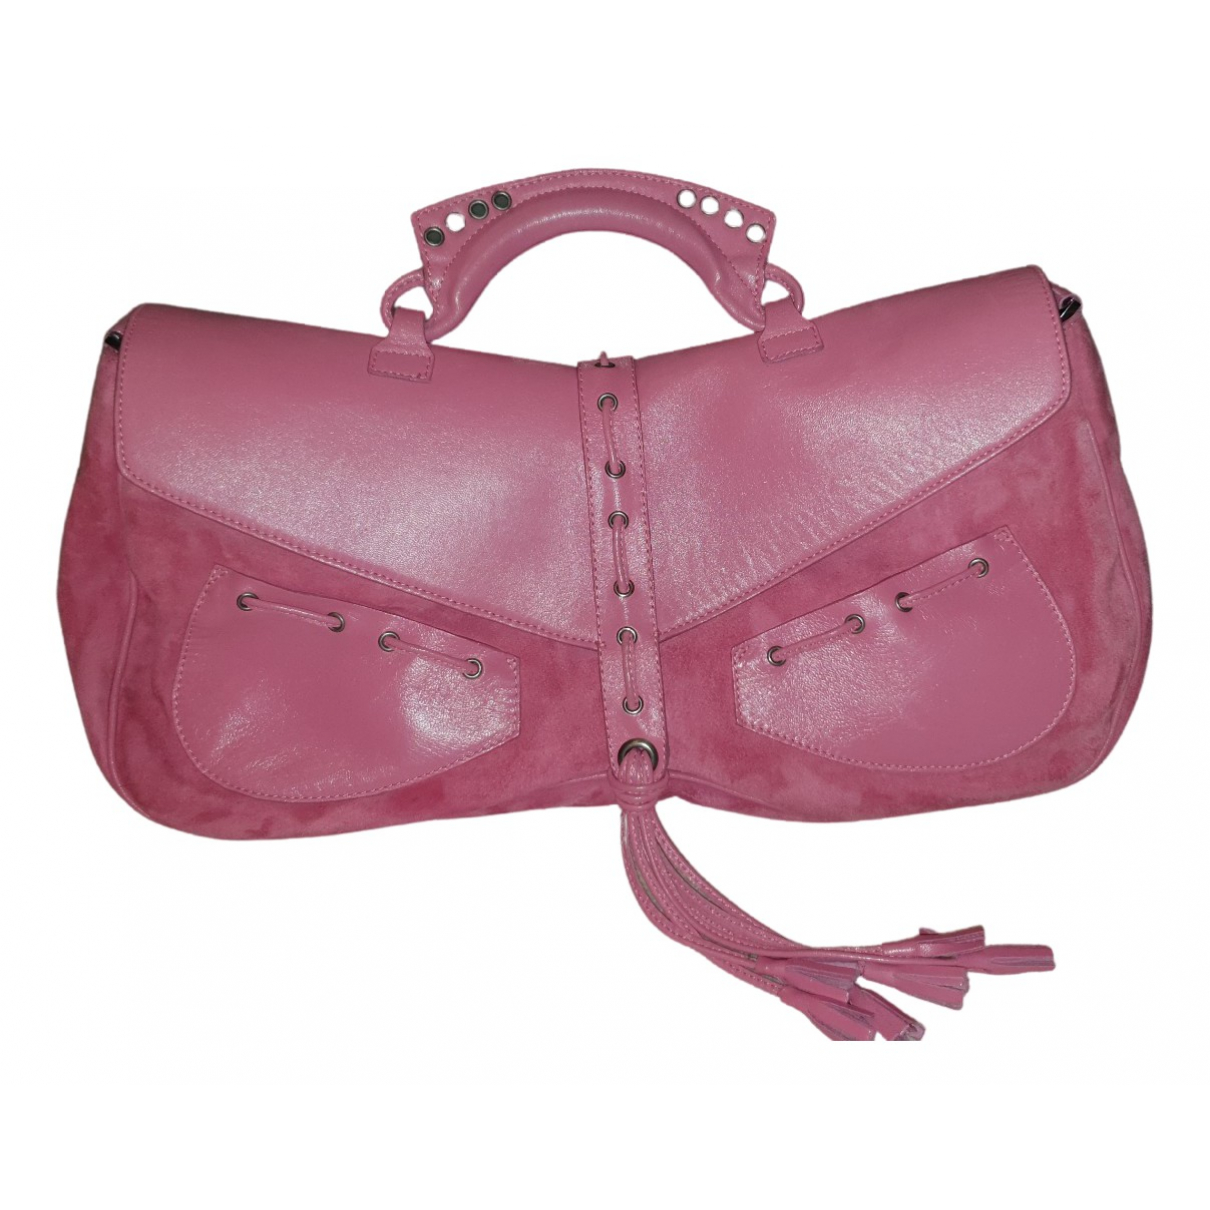 Giuseppe Zanotti \N Pink Suede handbag for Women \N